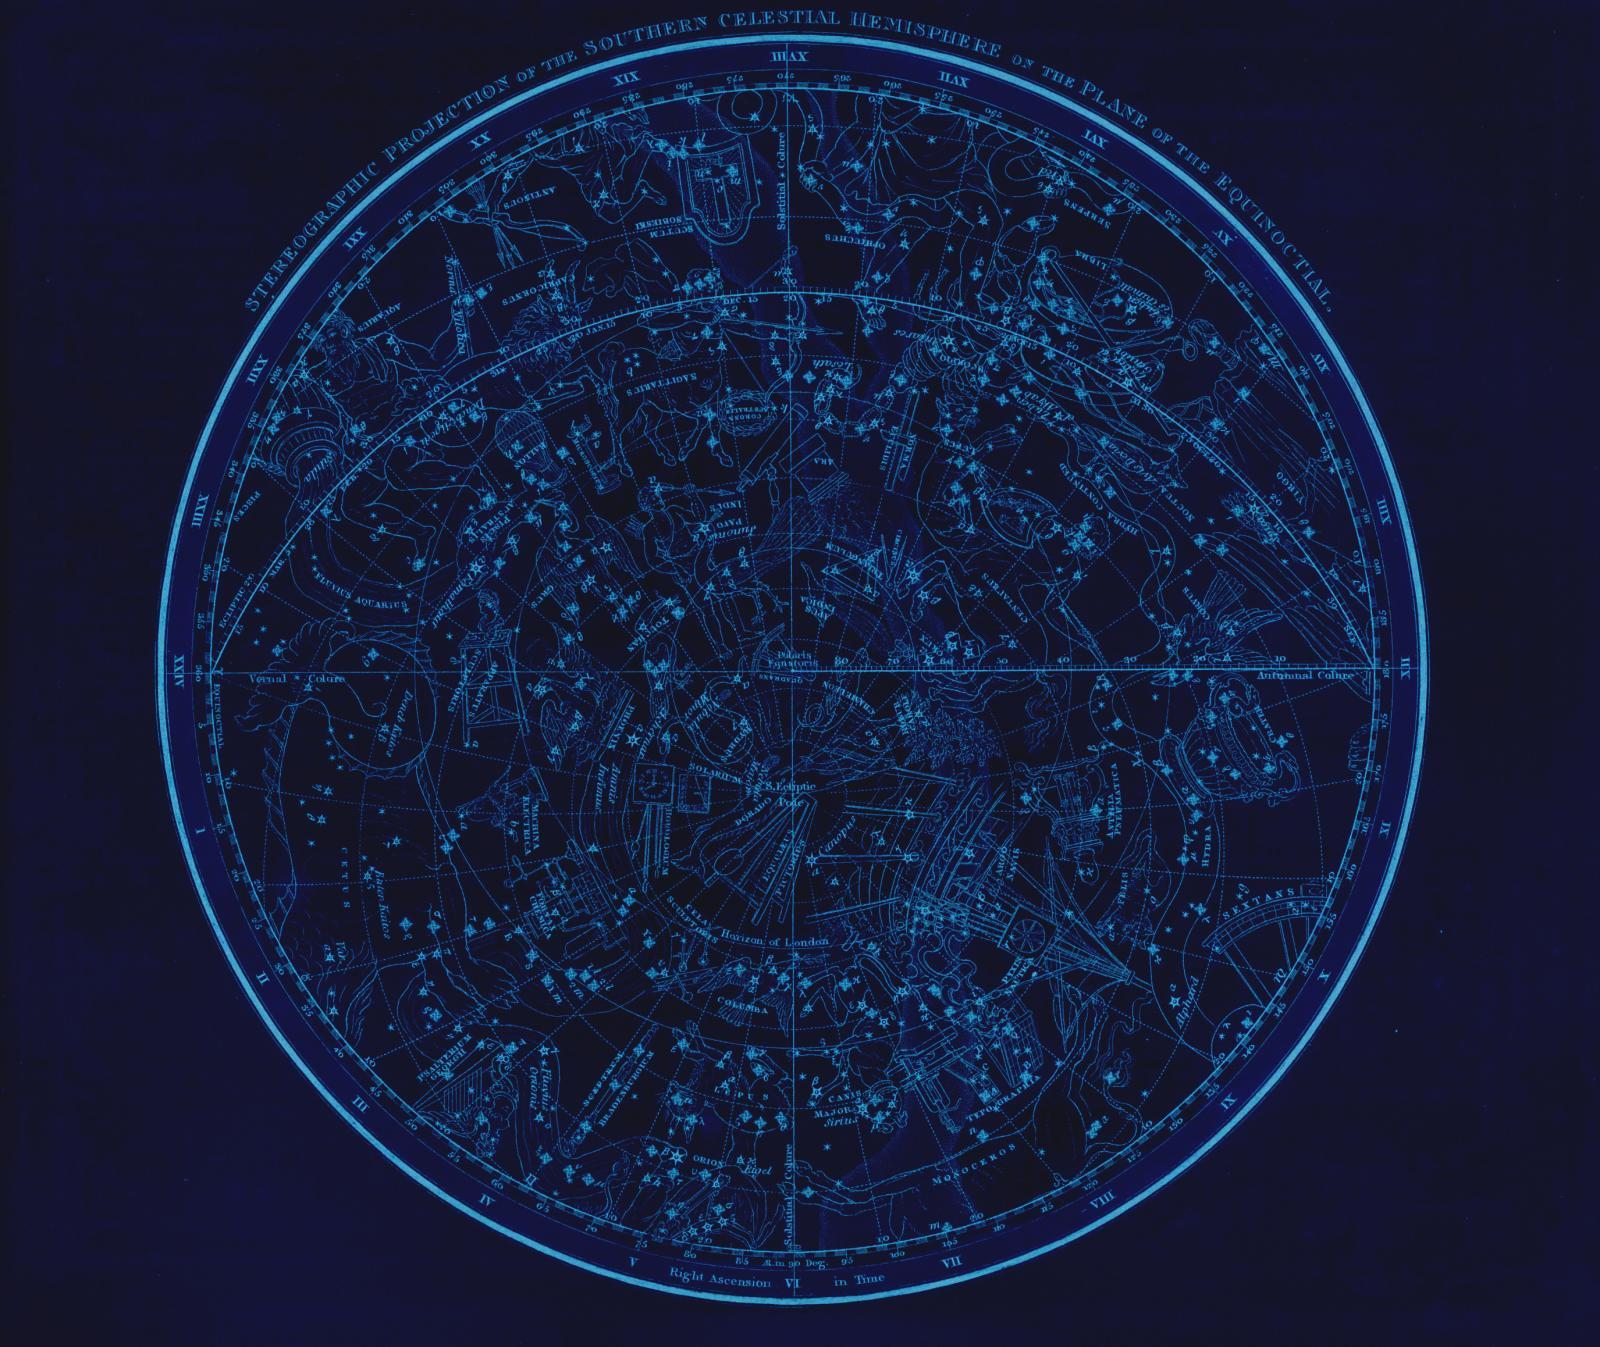 Mapa estelar zodiaco